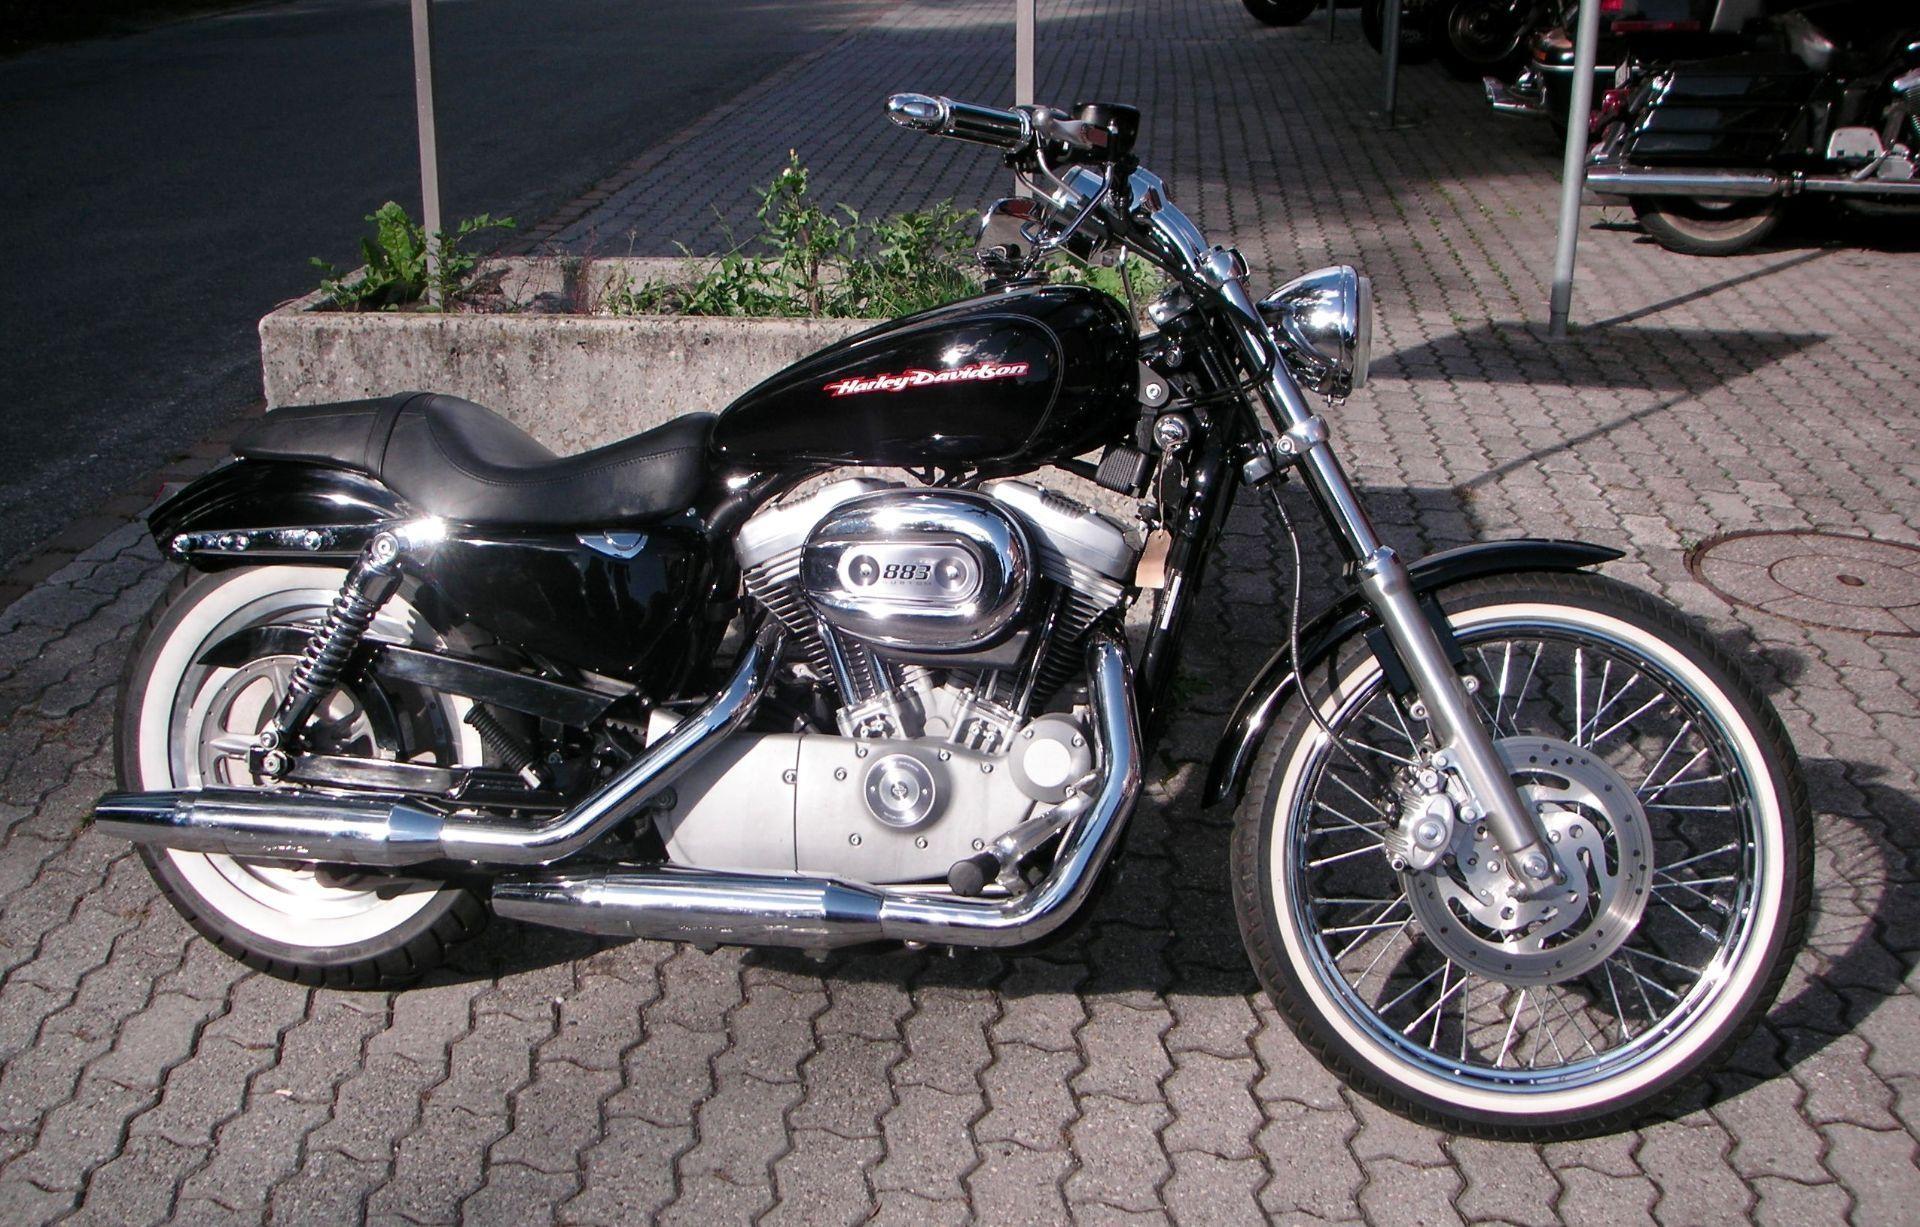 motorrad occasion kaufen harley davidson xlh 883 53c sportster grischa motorcycles gmbh trimmis. Black Bedroom Furniture Sets. Home Design Ideas